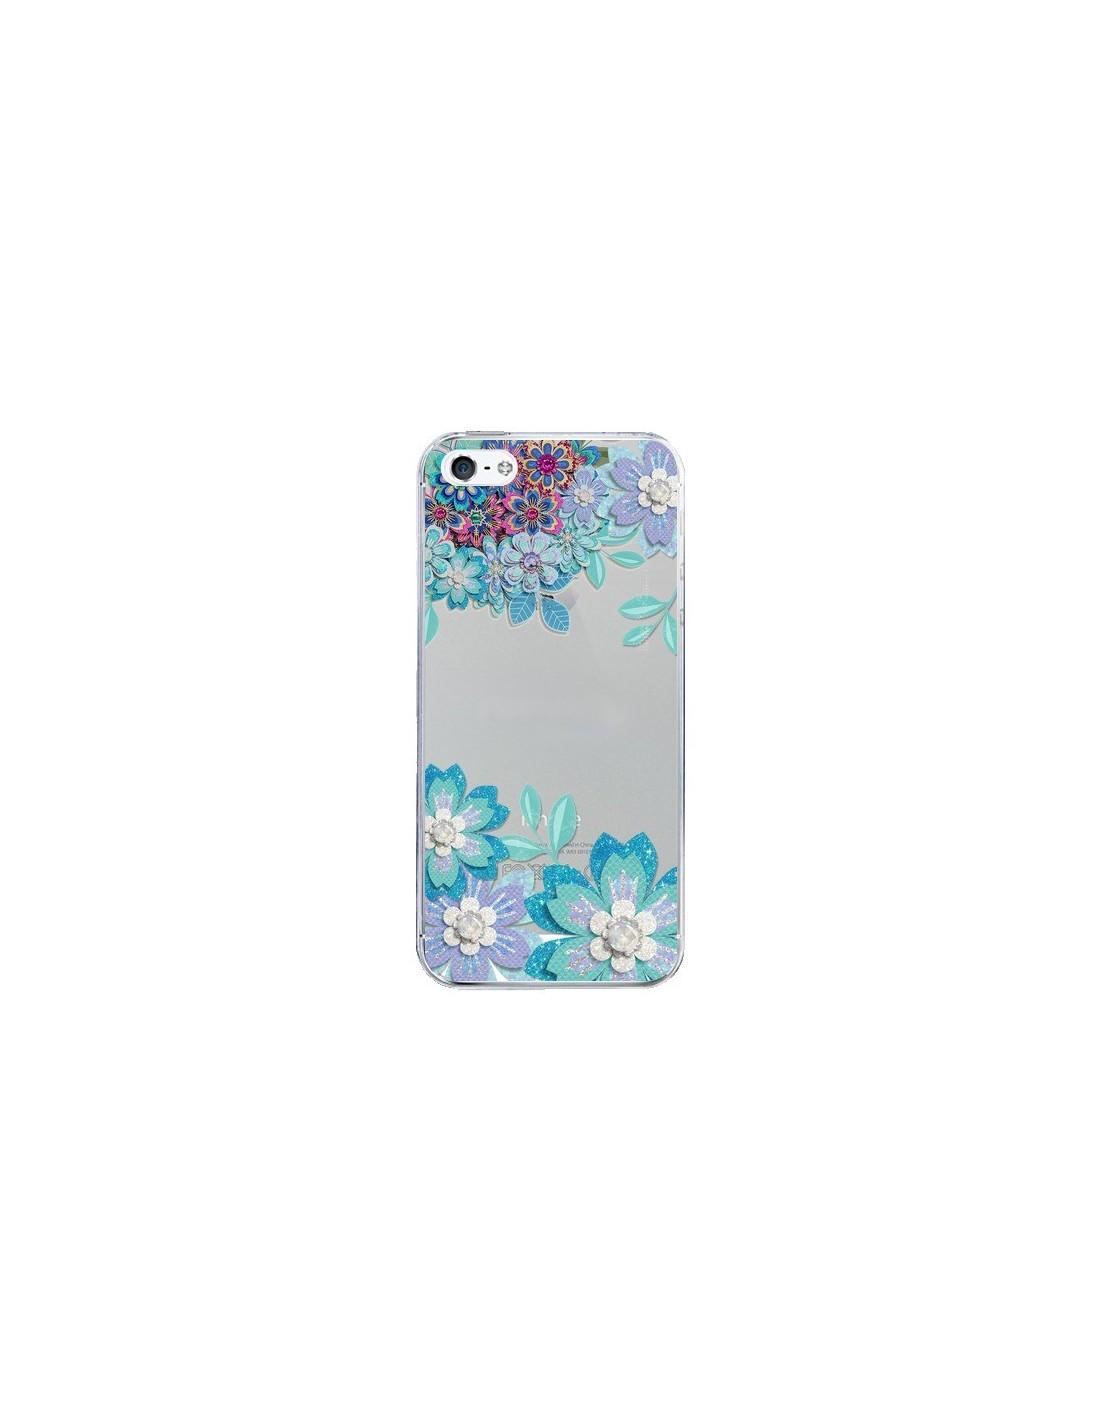 coque iphone 5 5s se winter flower bleu fleurs d hiver transparente sylvia cook